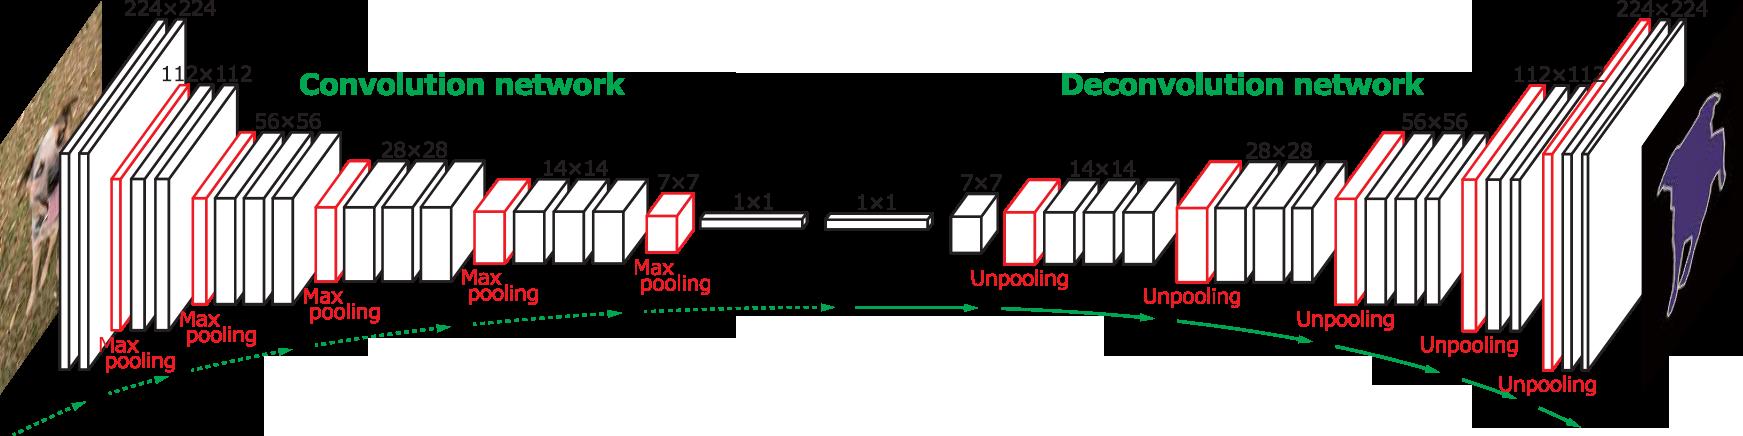 Learning Deconvolution Network for Semantic Segmentation